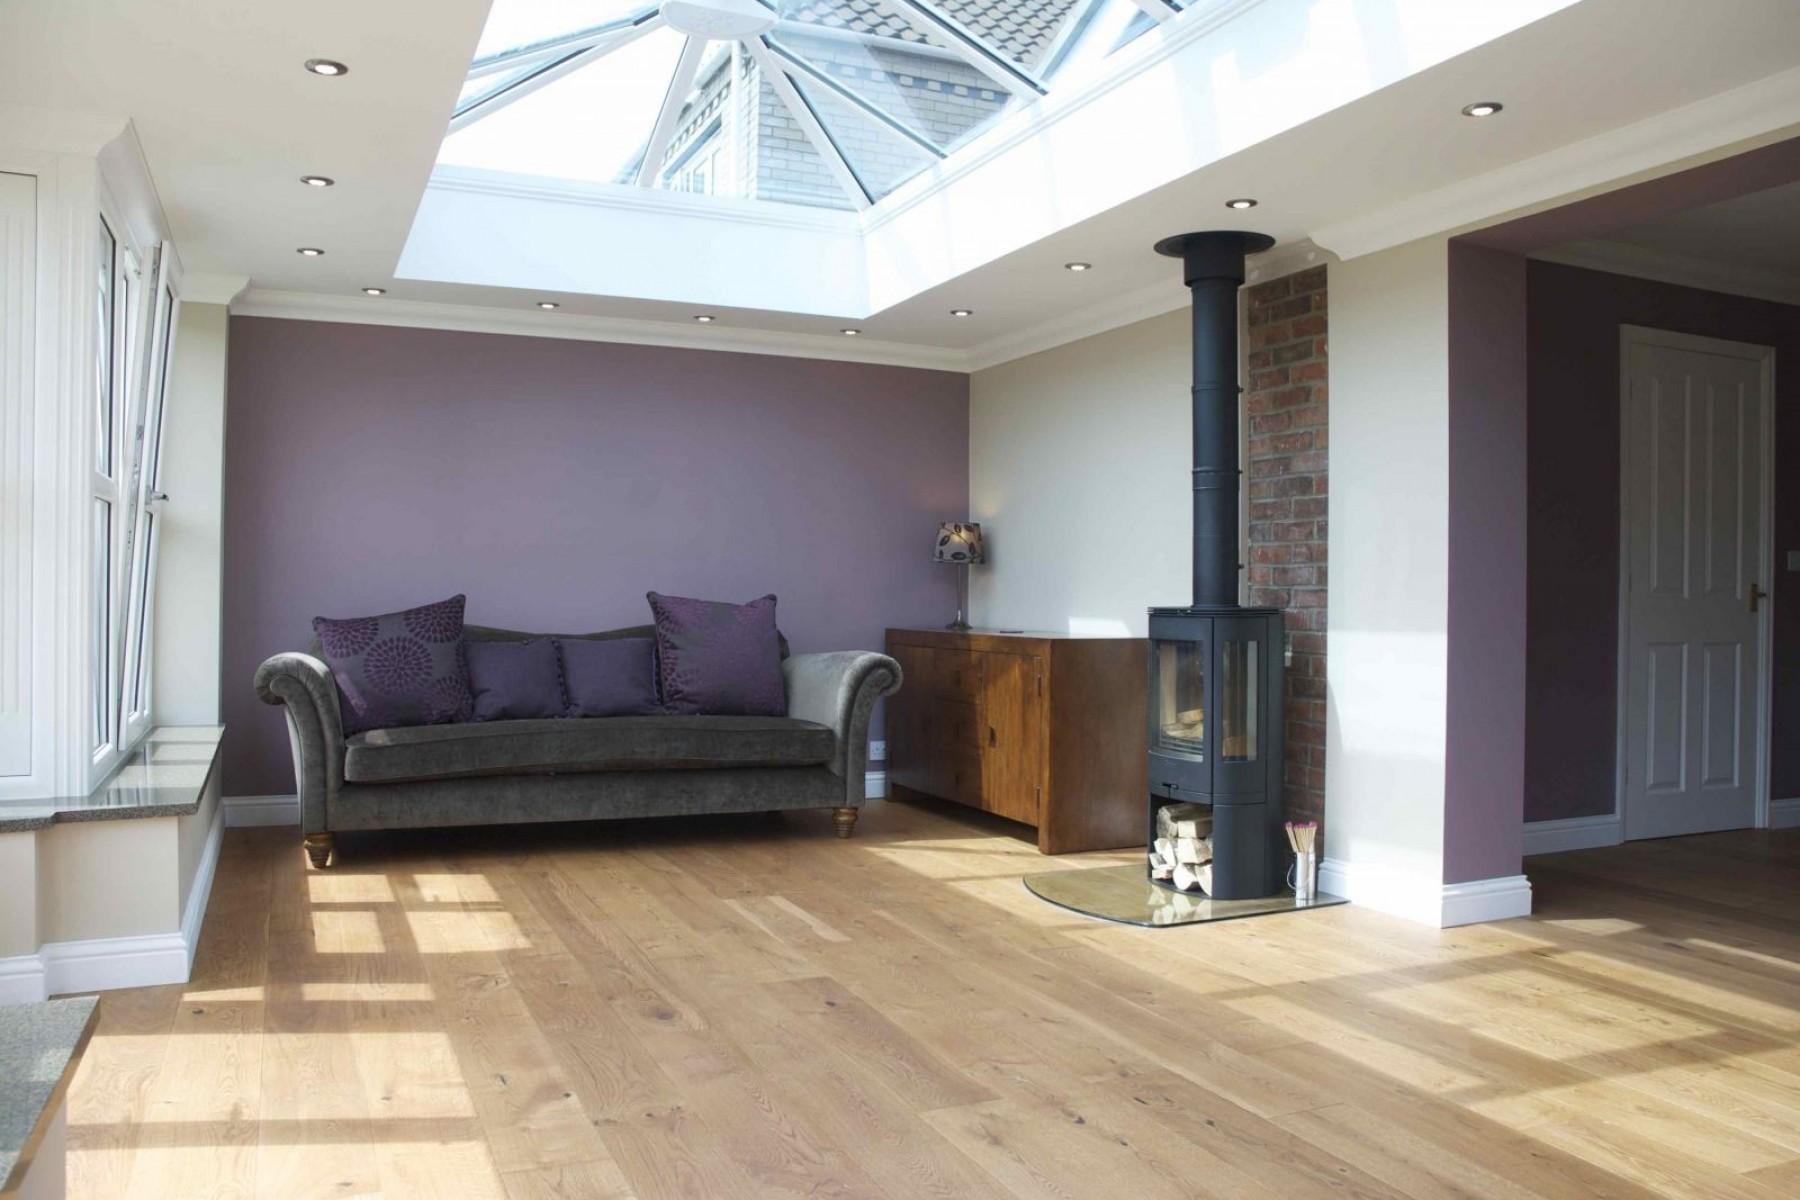 Shaws of brighton aluminium conservatory roofs